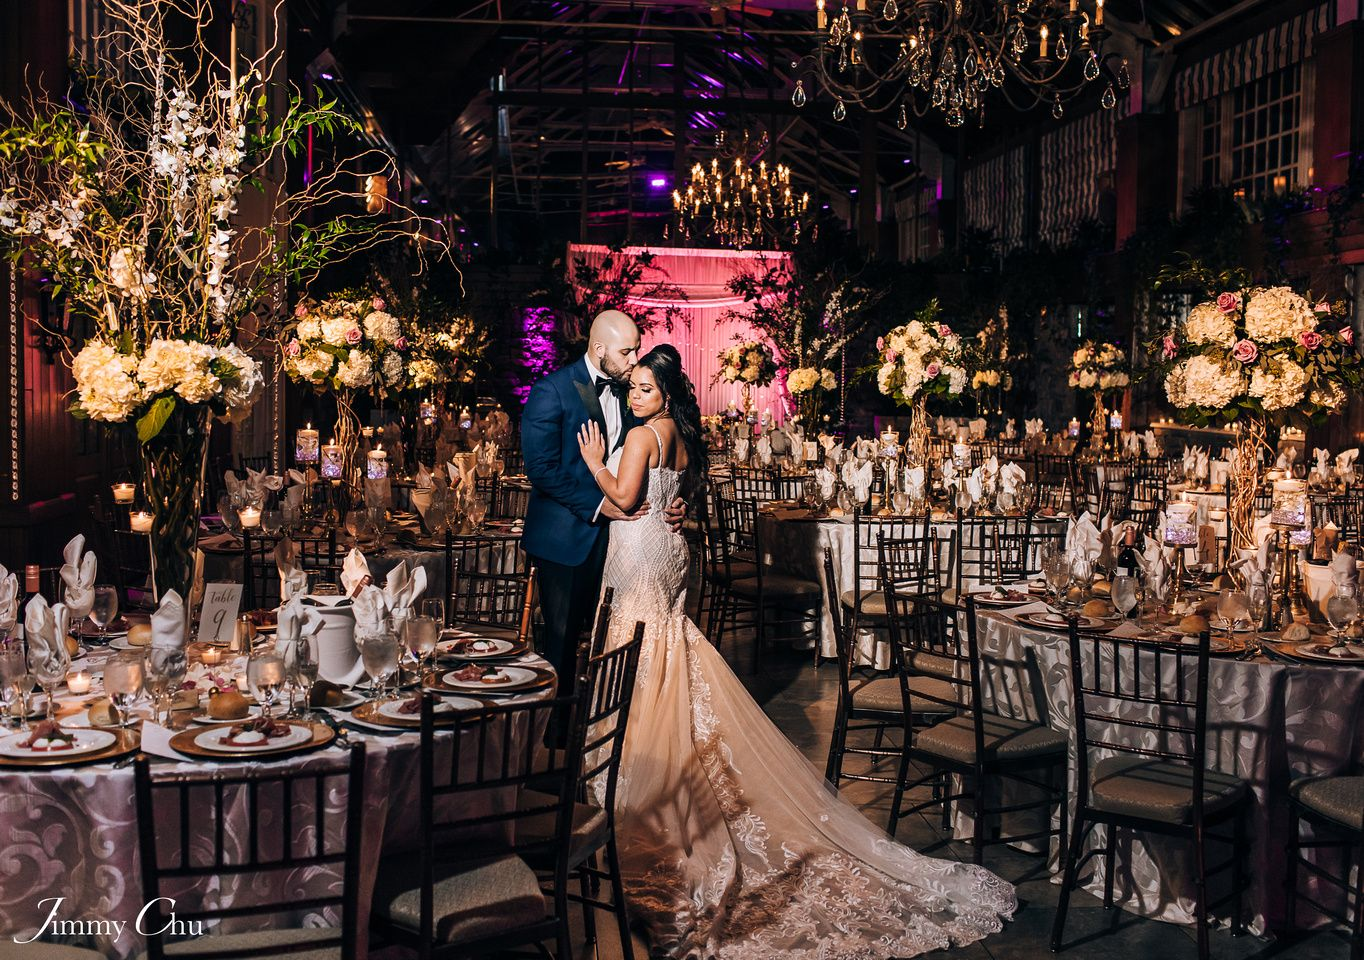 Sofy Angel S Wedding At The Fox Hollow Woodbury Ny Rustic Wedding Photographer Long Island Wedding Rustic Wedding